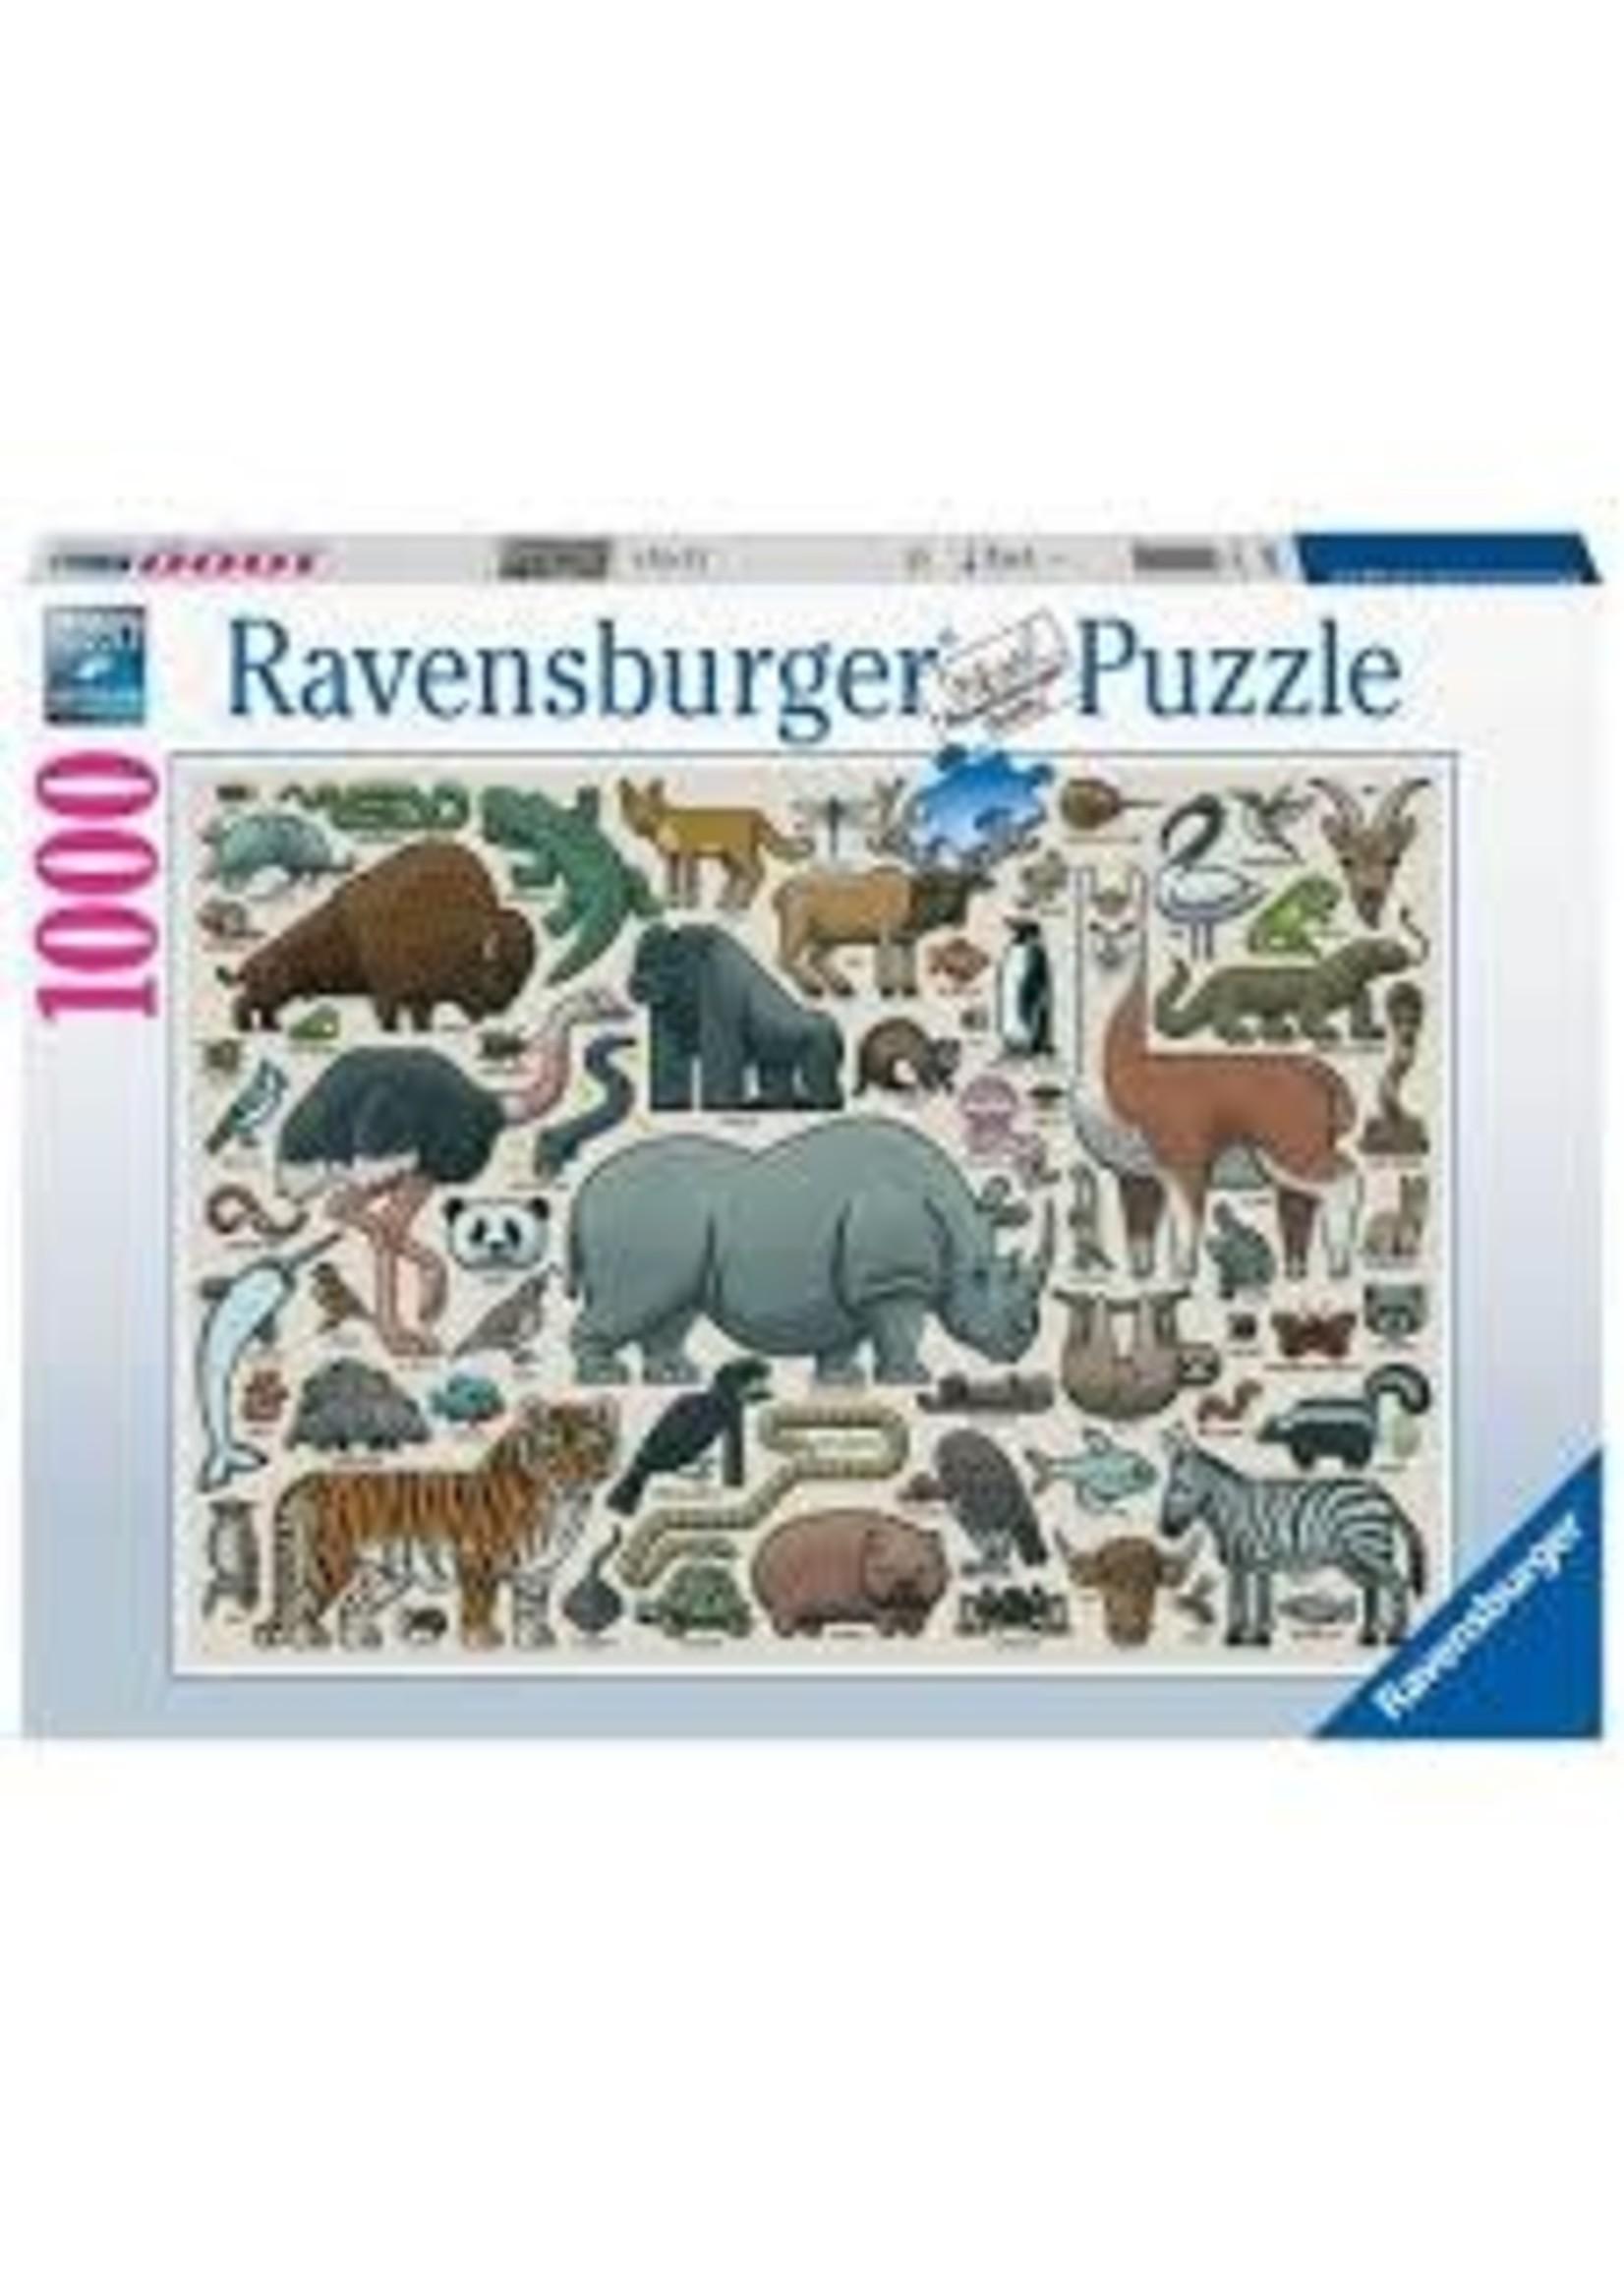 Ravensburger 1000pc puzzle You Wild Animal